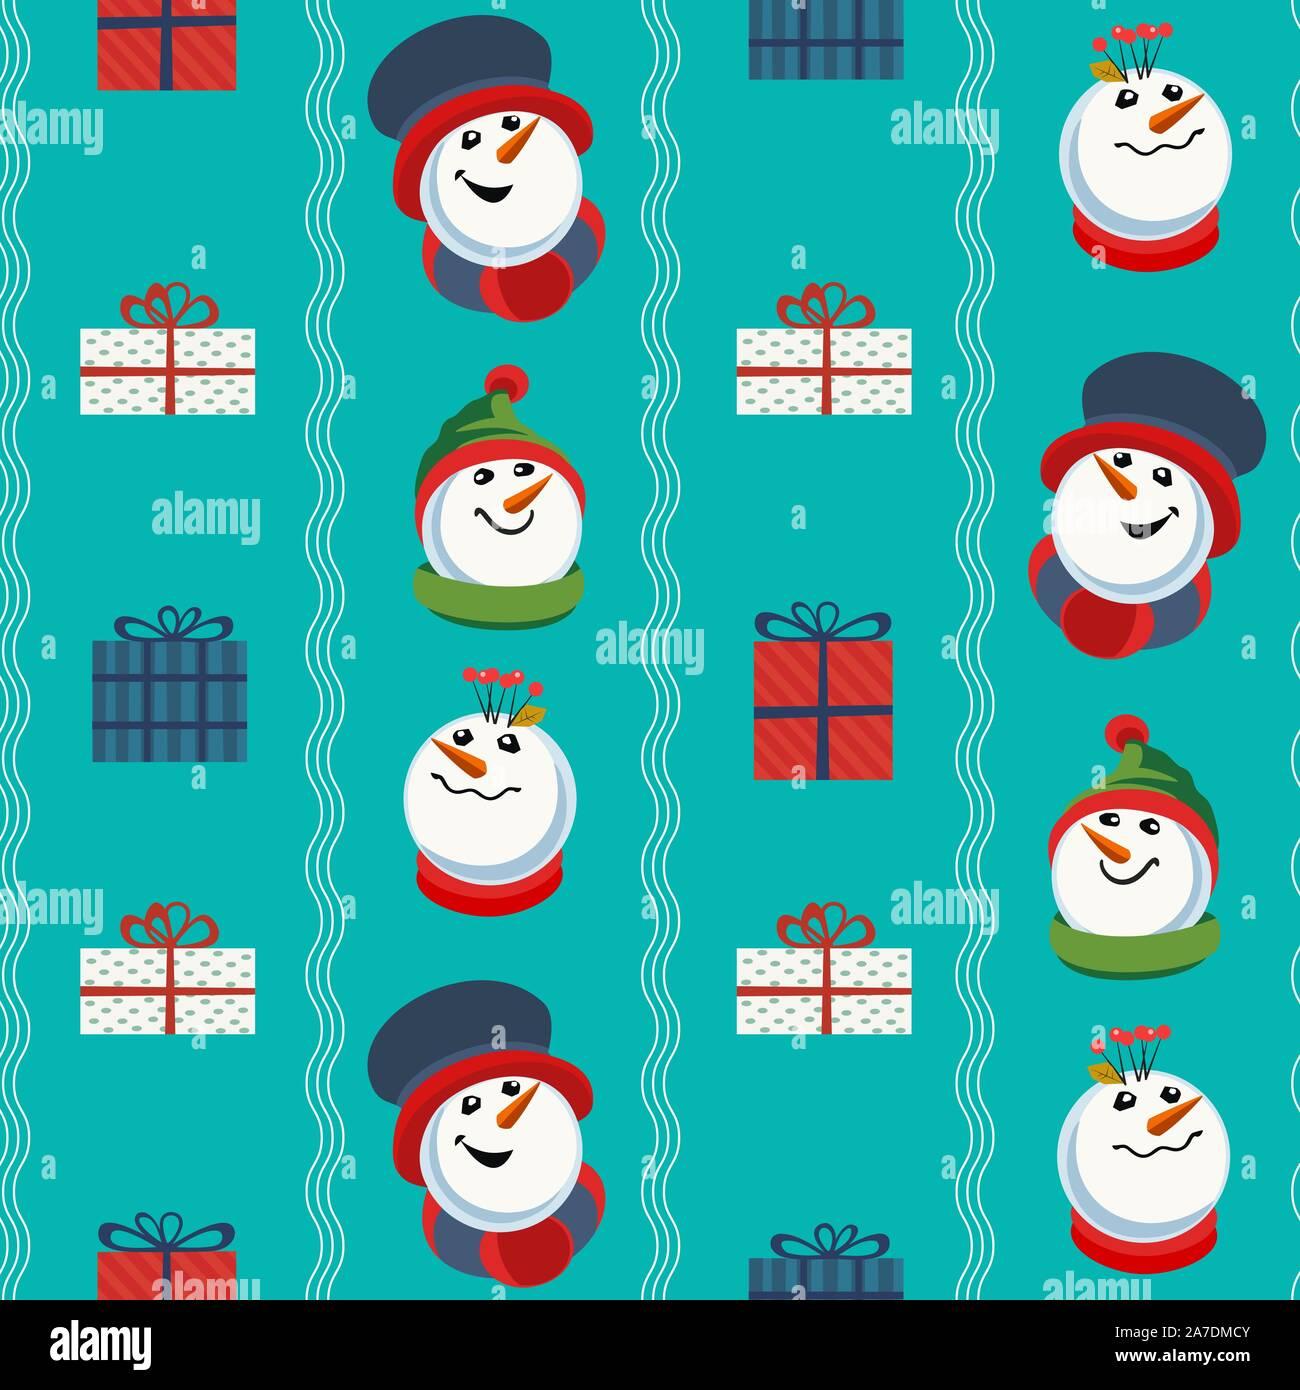 cute snowman hand drawn vector seamless pattern holiday cartoon fun snowball merry christmas winter season decorative wallpaper new year eve web ba 2A7DMCY